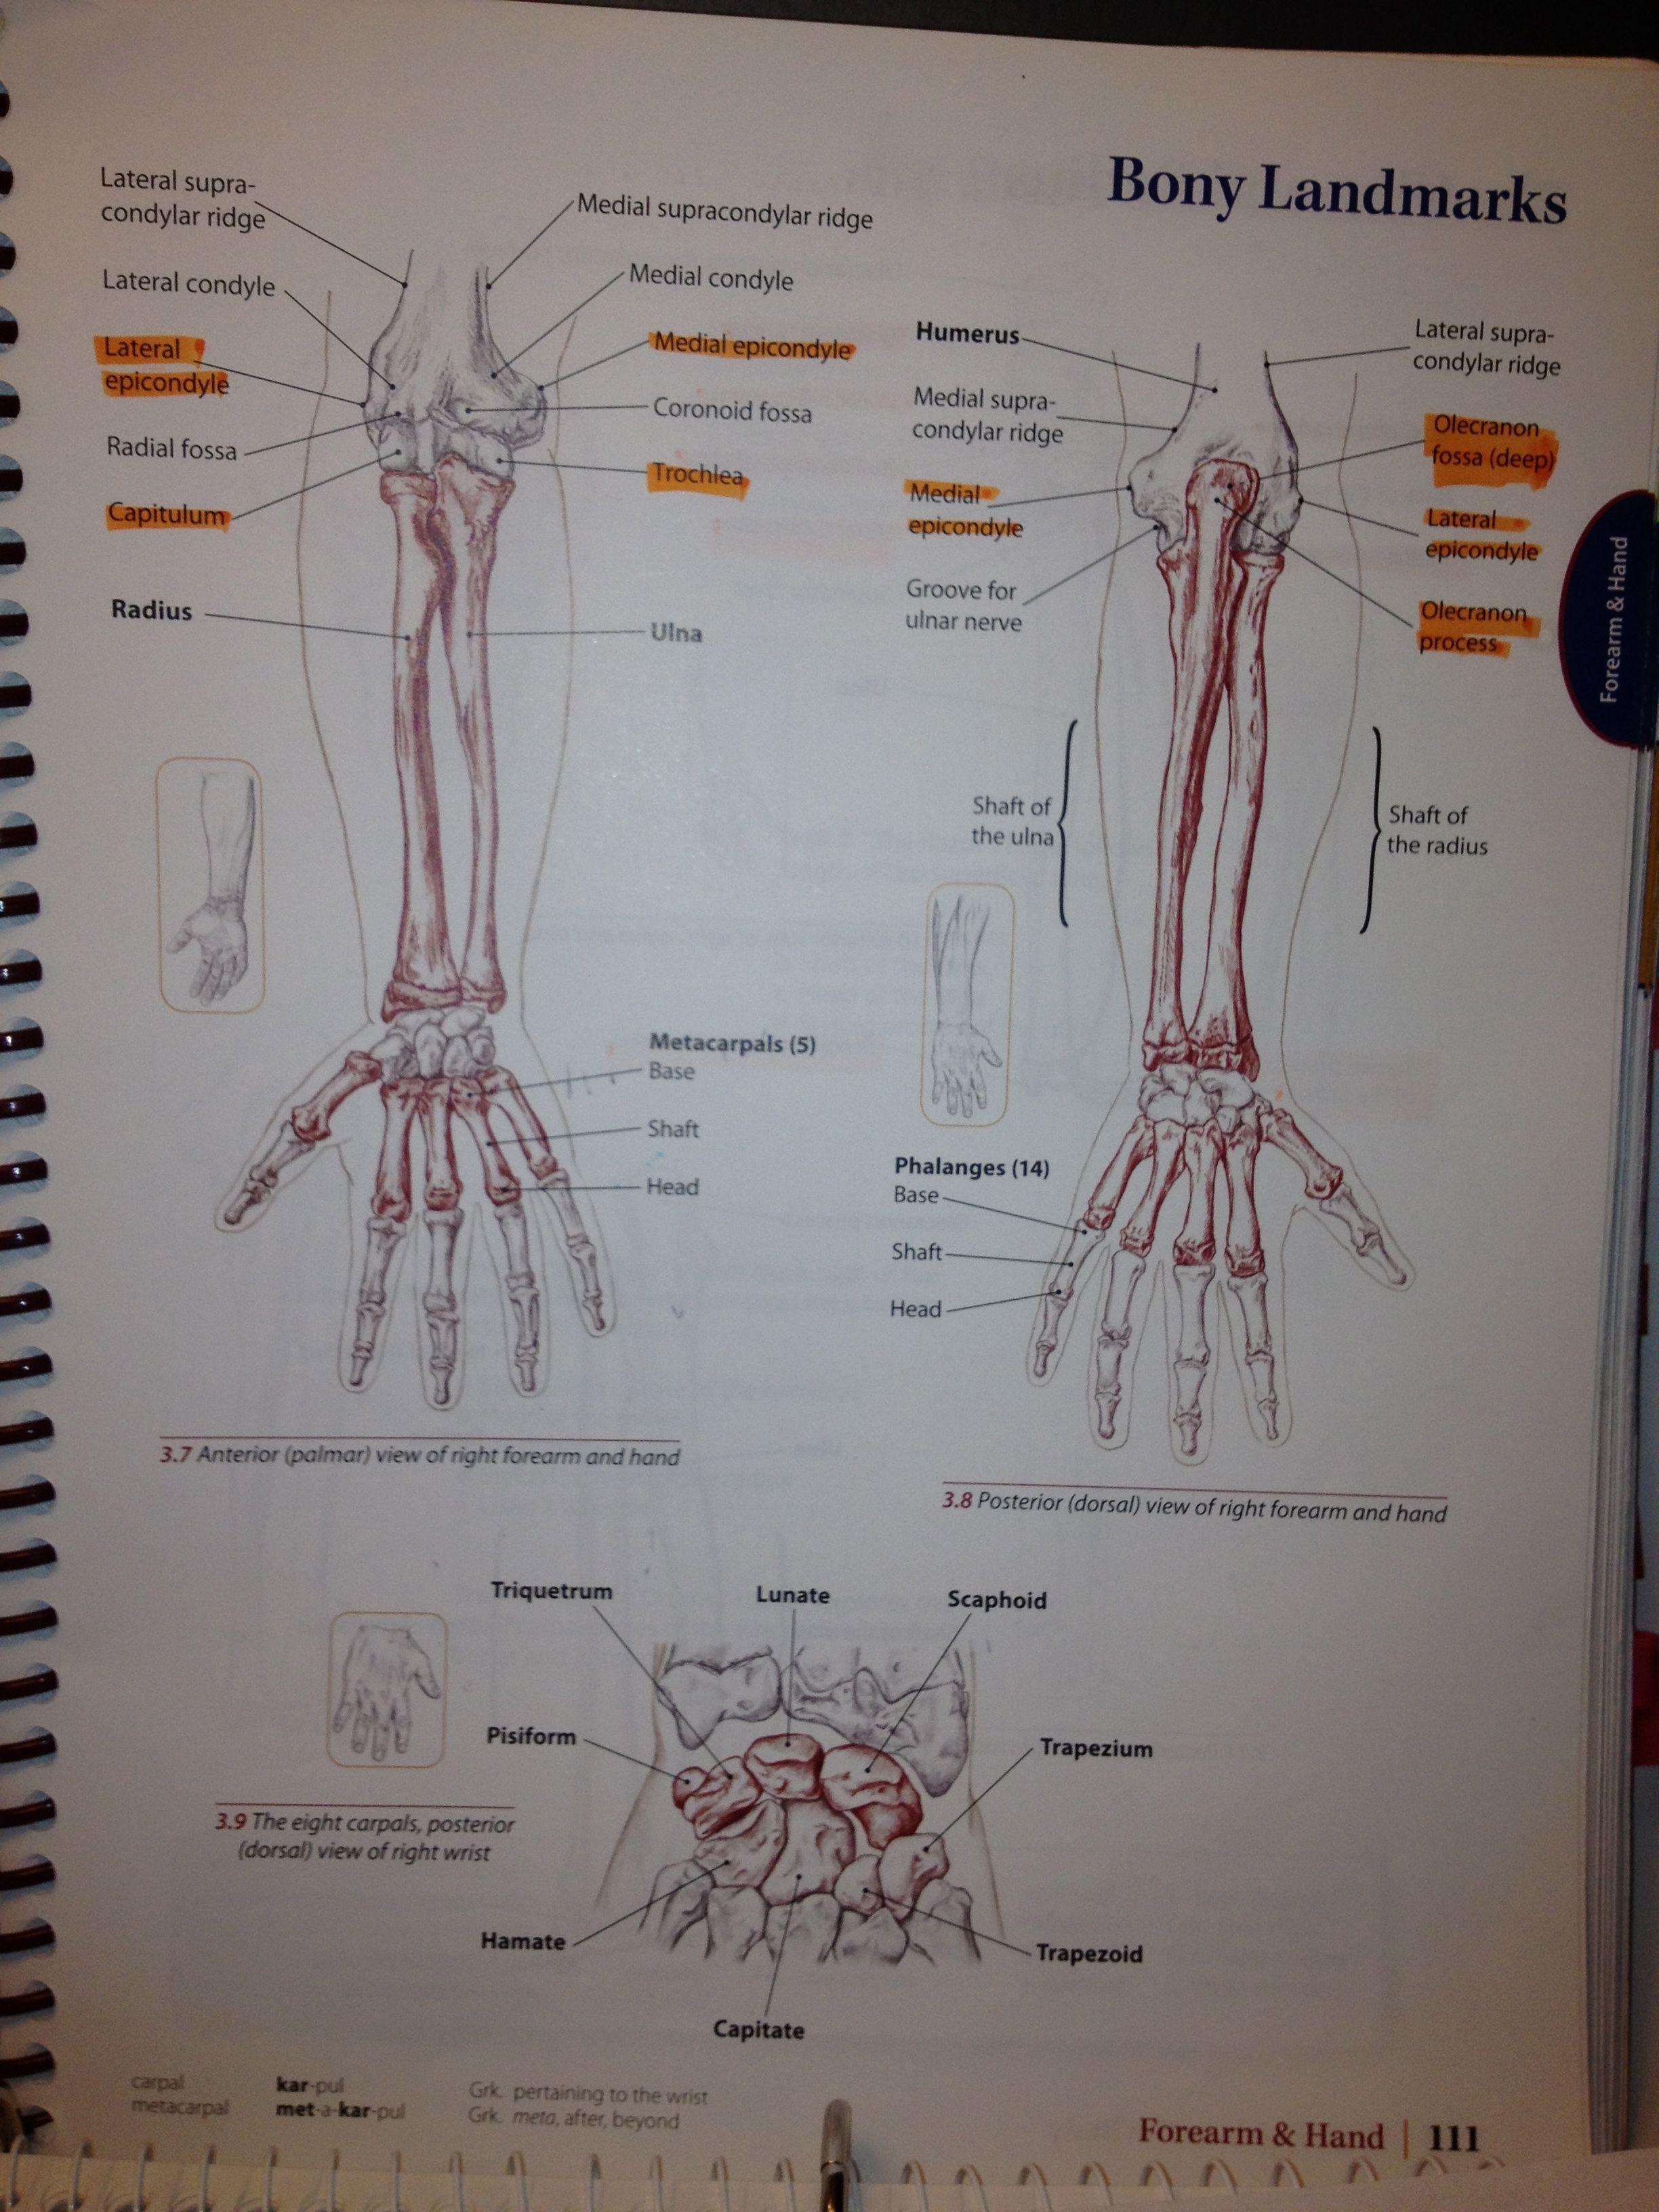 Bony Landmarks Of Forearm Wrist And Hand